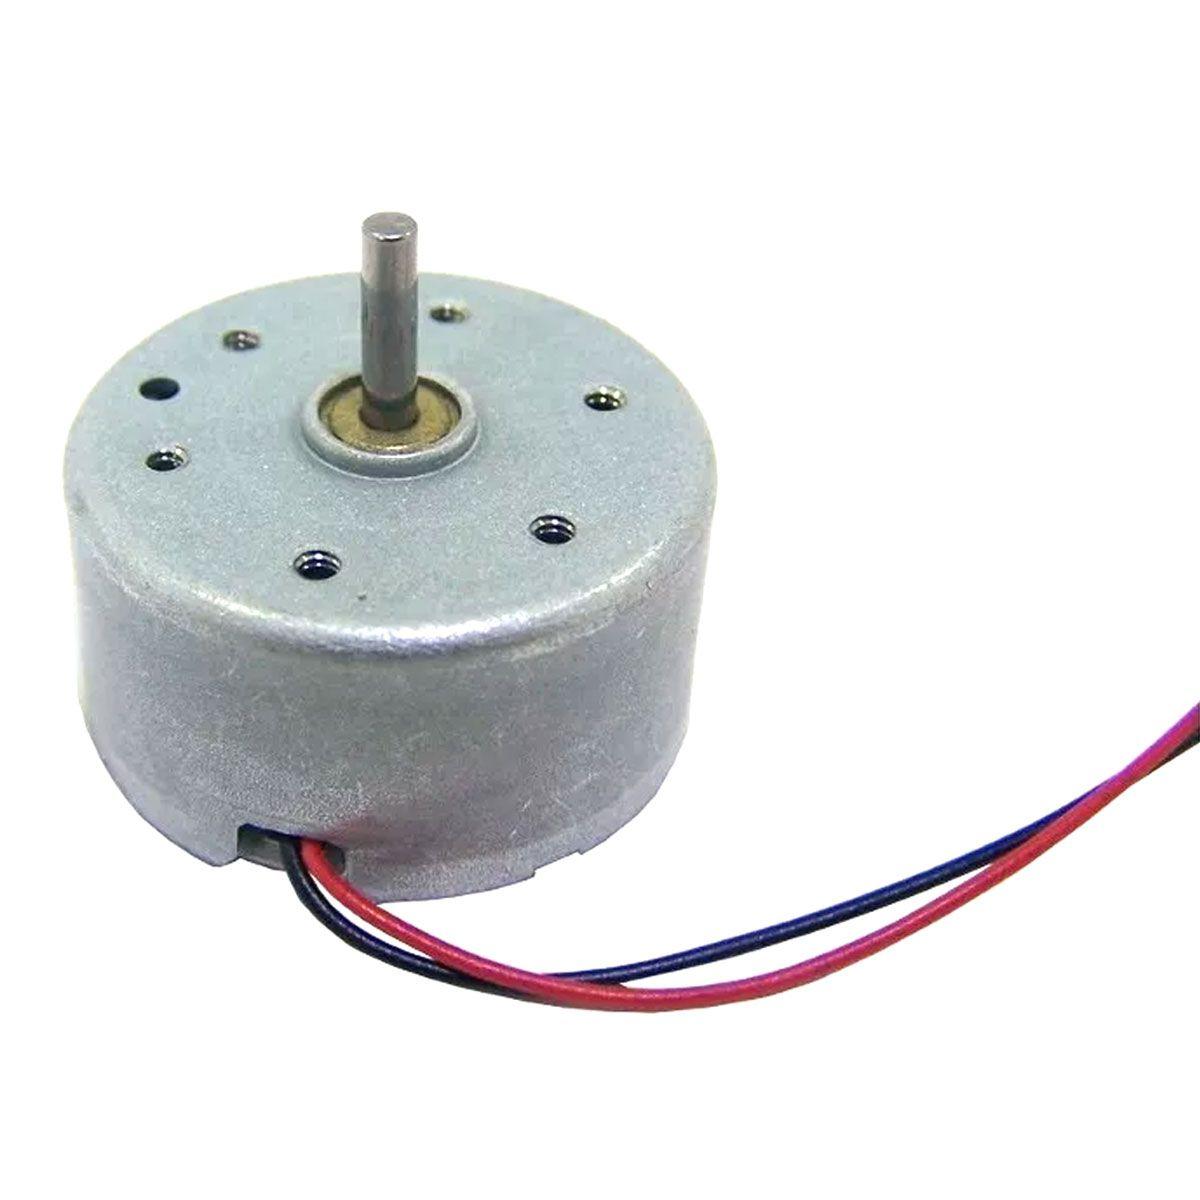 2x Motor de DVD rf-300ca 5,9V 6600 RPM